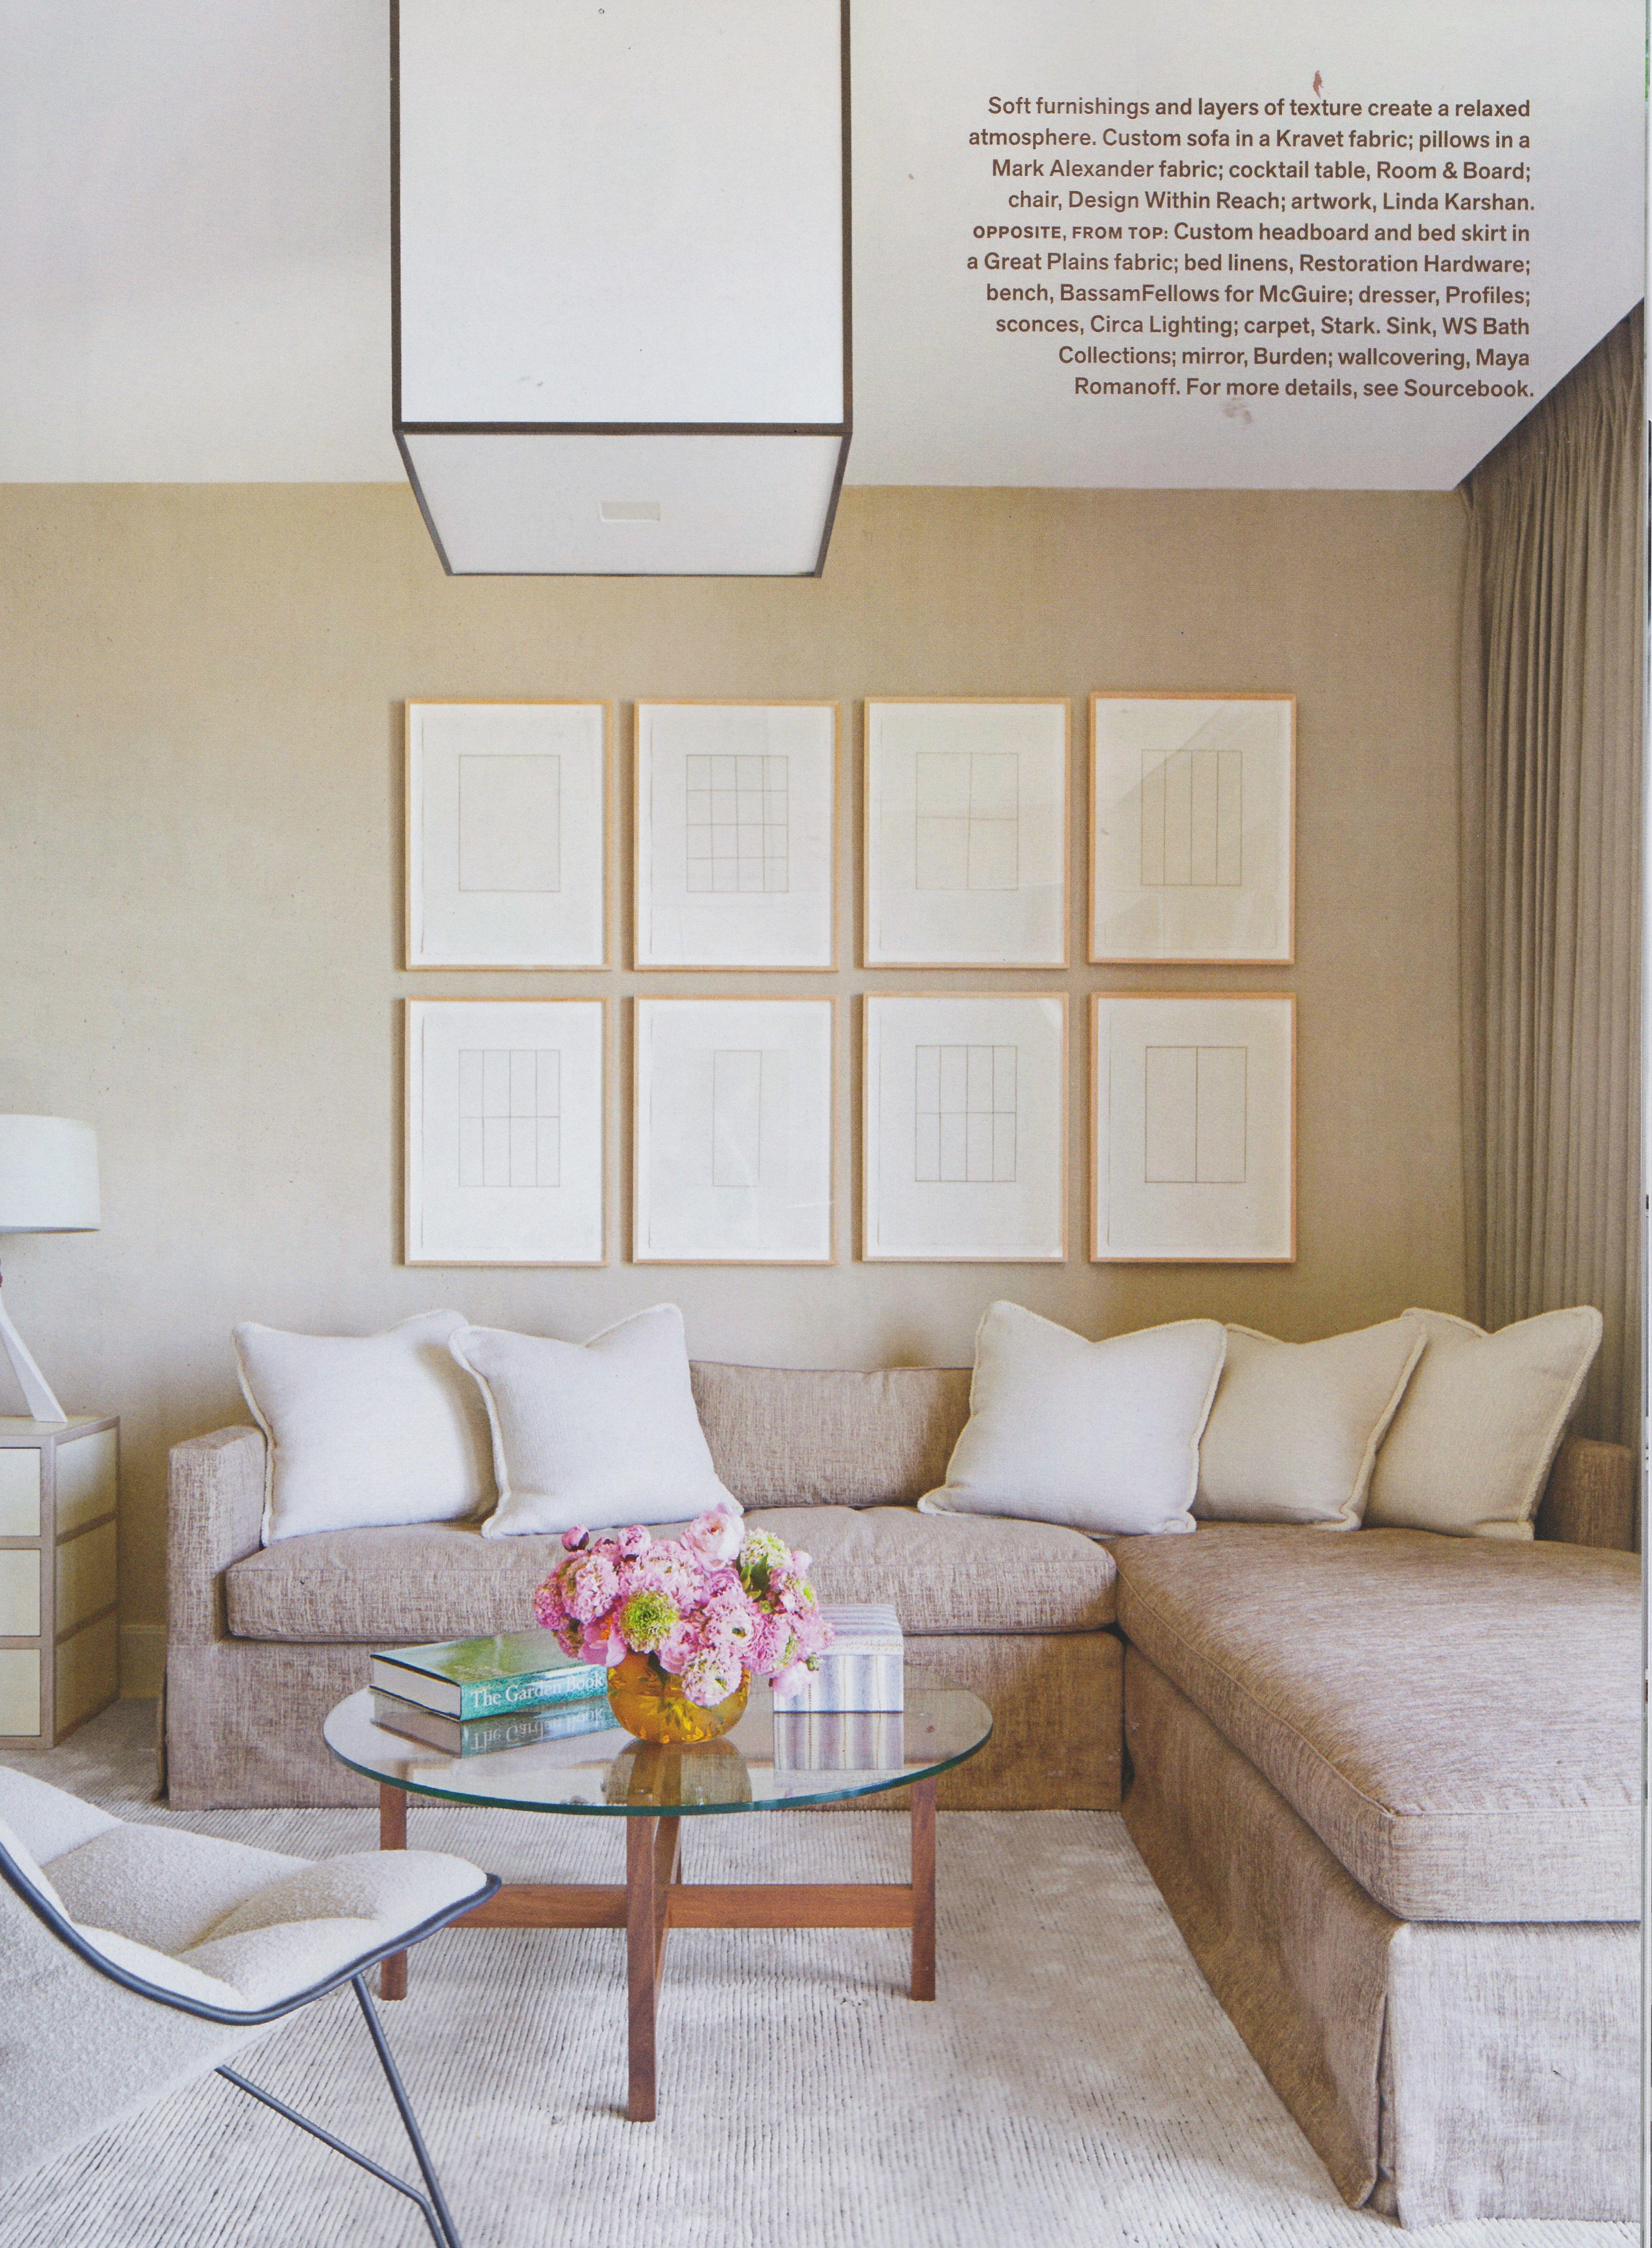 Campion Platt, Palm Beach, Veranda Magazine, Neutral, Family Room, Art In